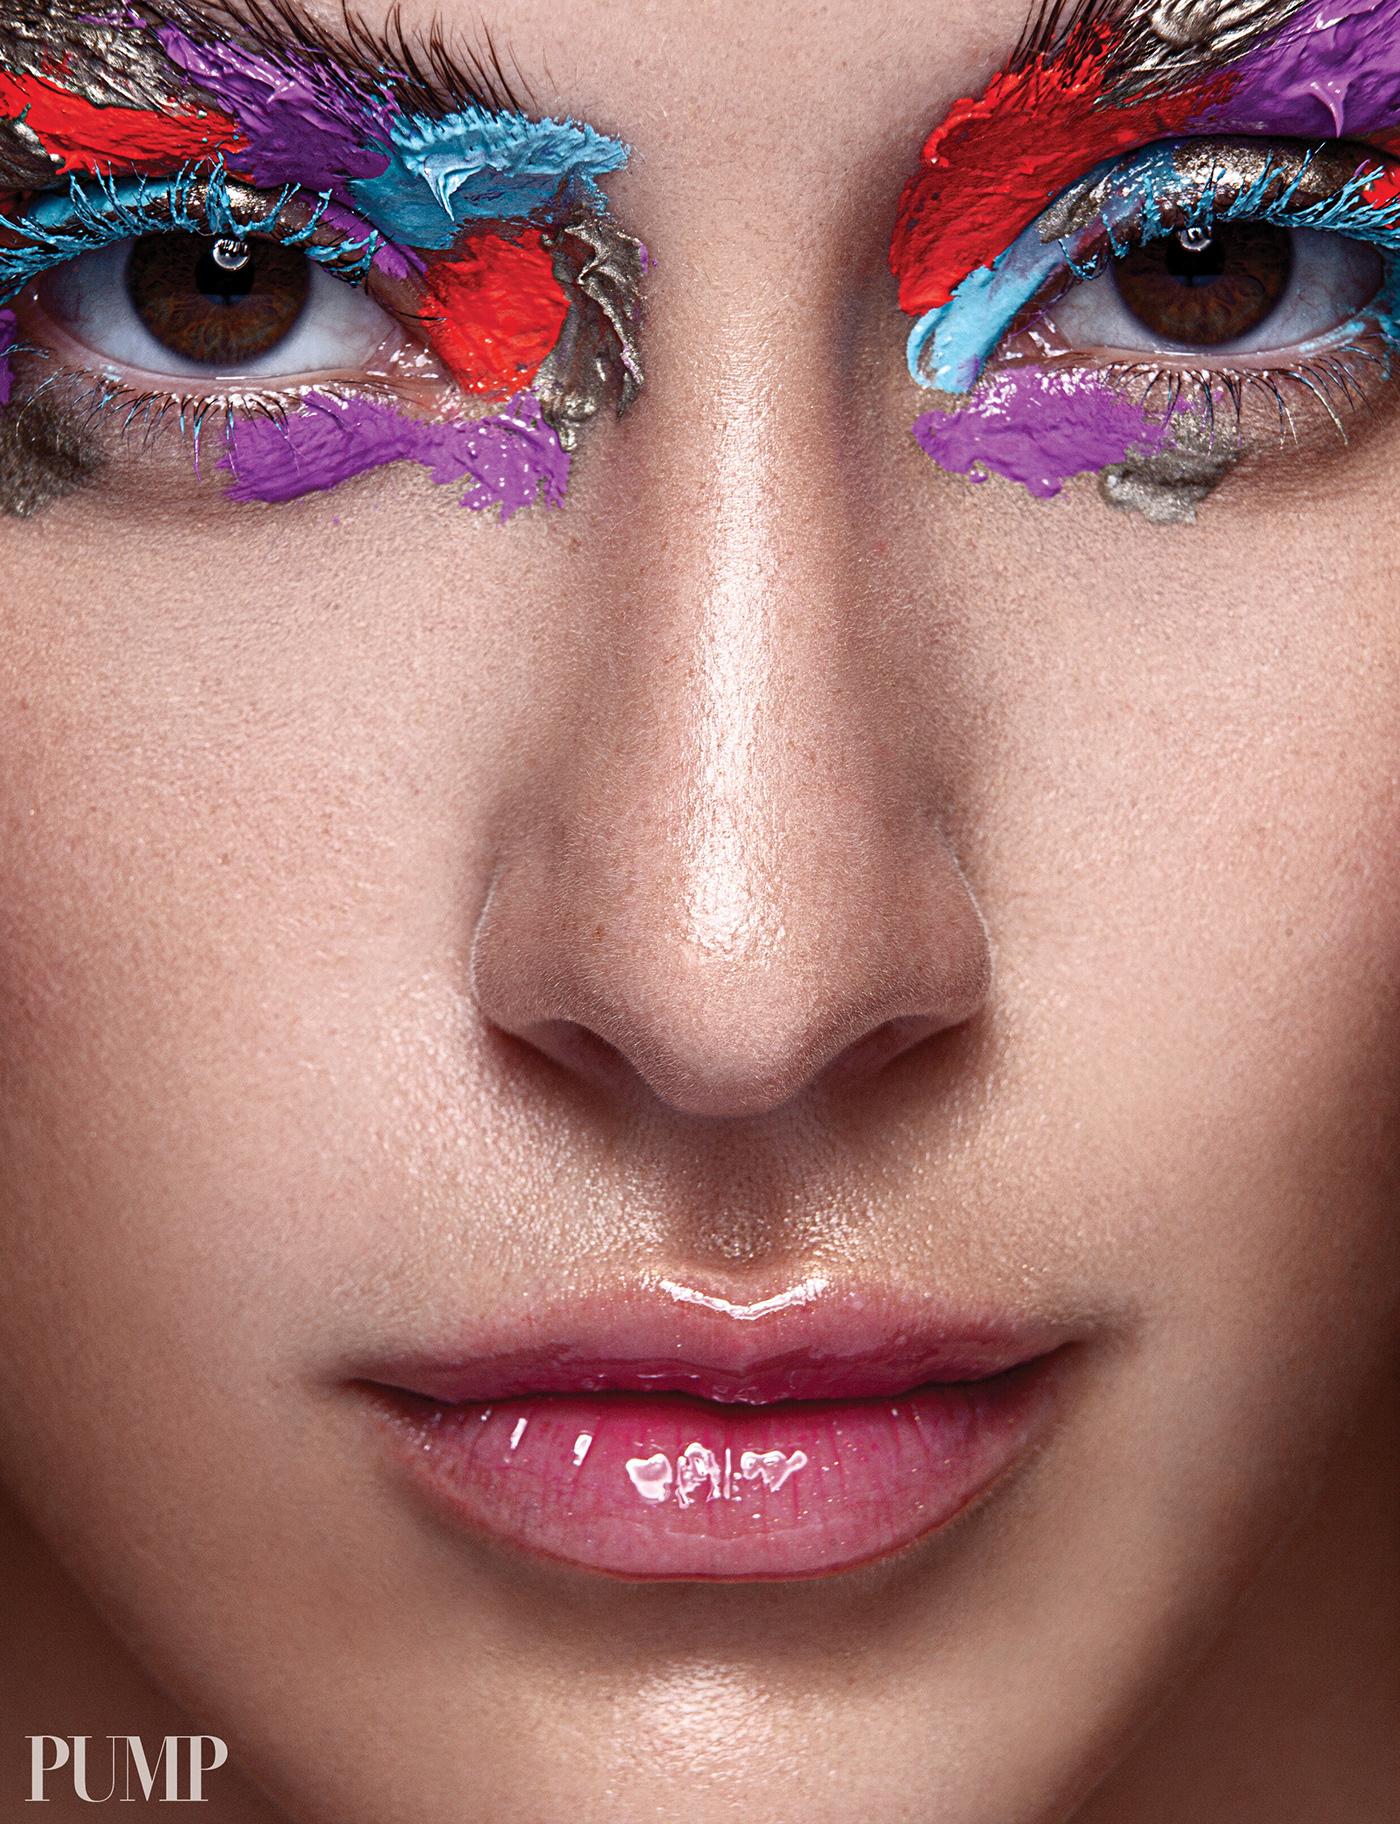 beauty editorial Fashion  Make Up MAKE UP ARTIST maquillaje moda photoshop Post Production retouch